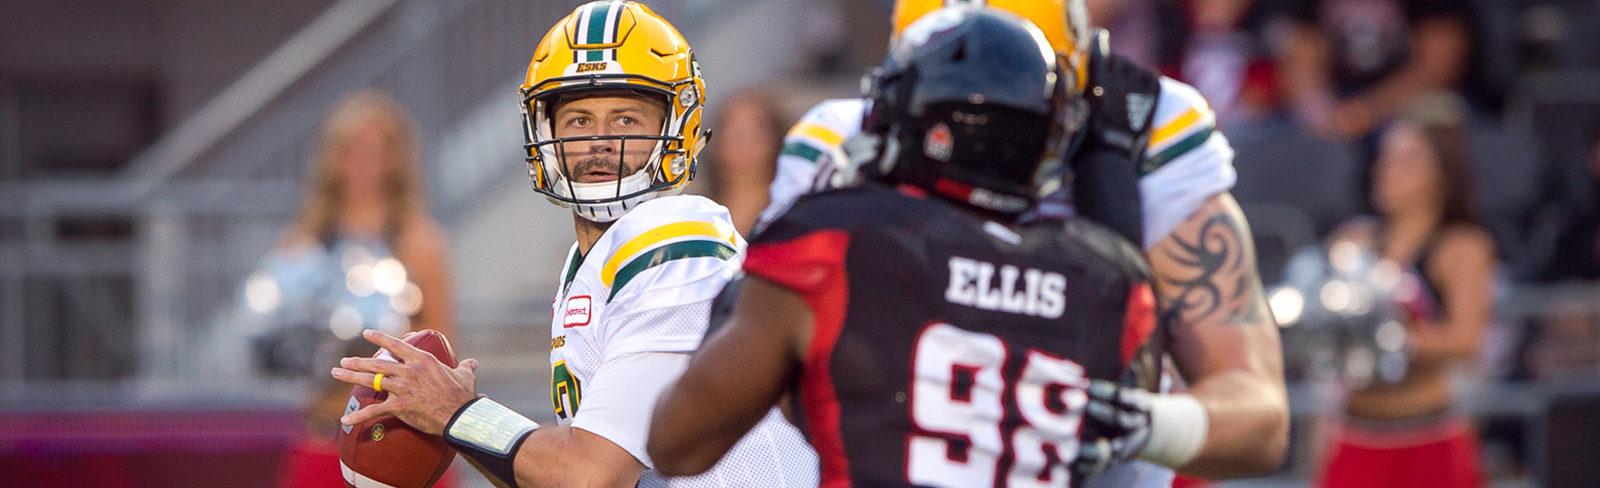 Eskimos hope Jackson kick-starts return game - Edmonton Eskimos